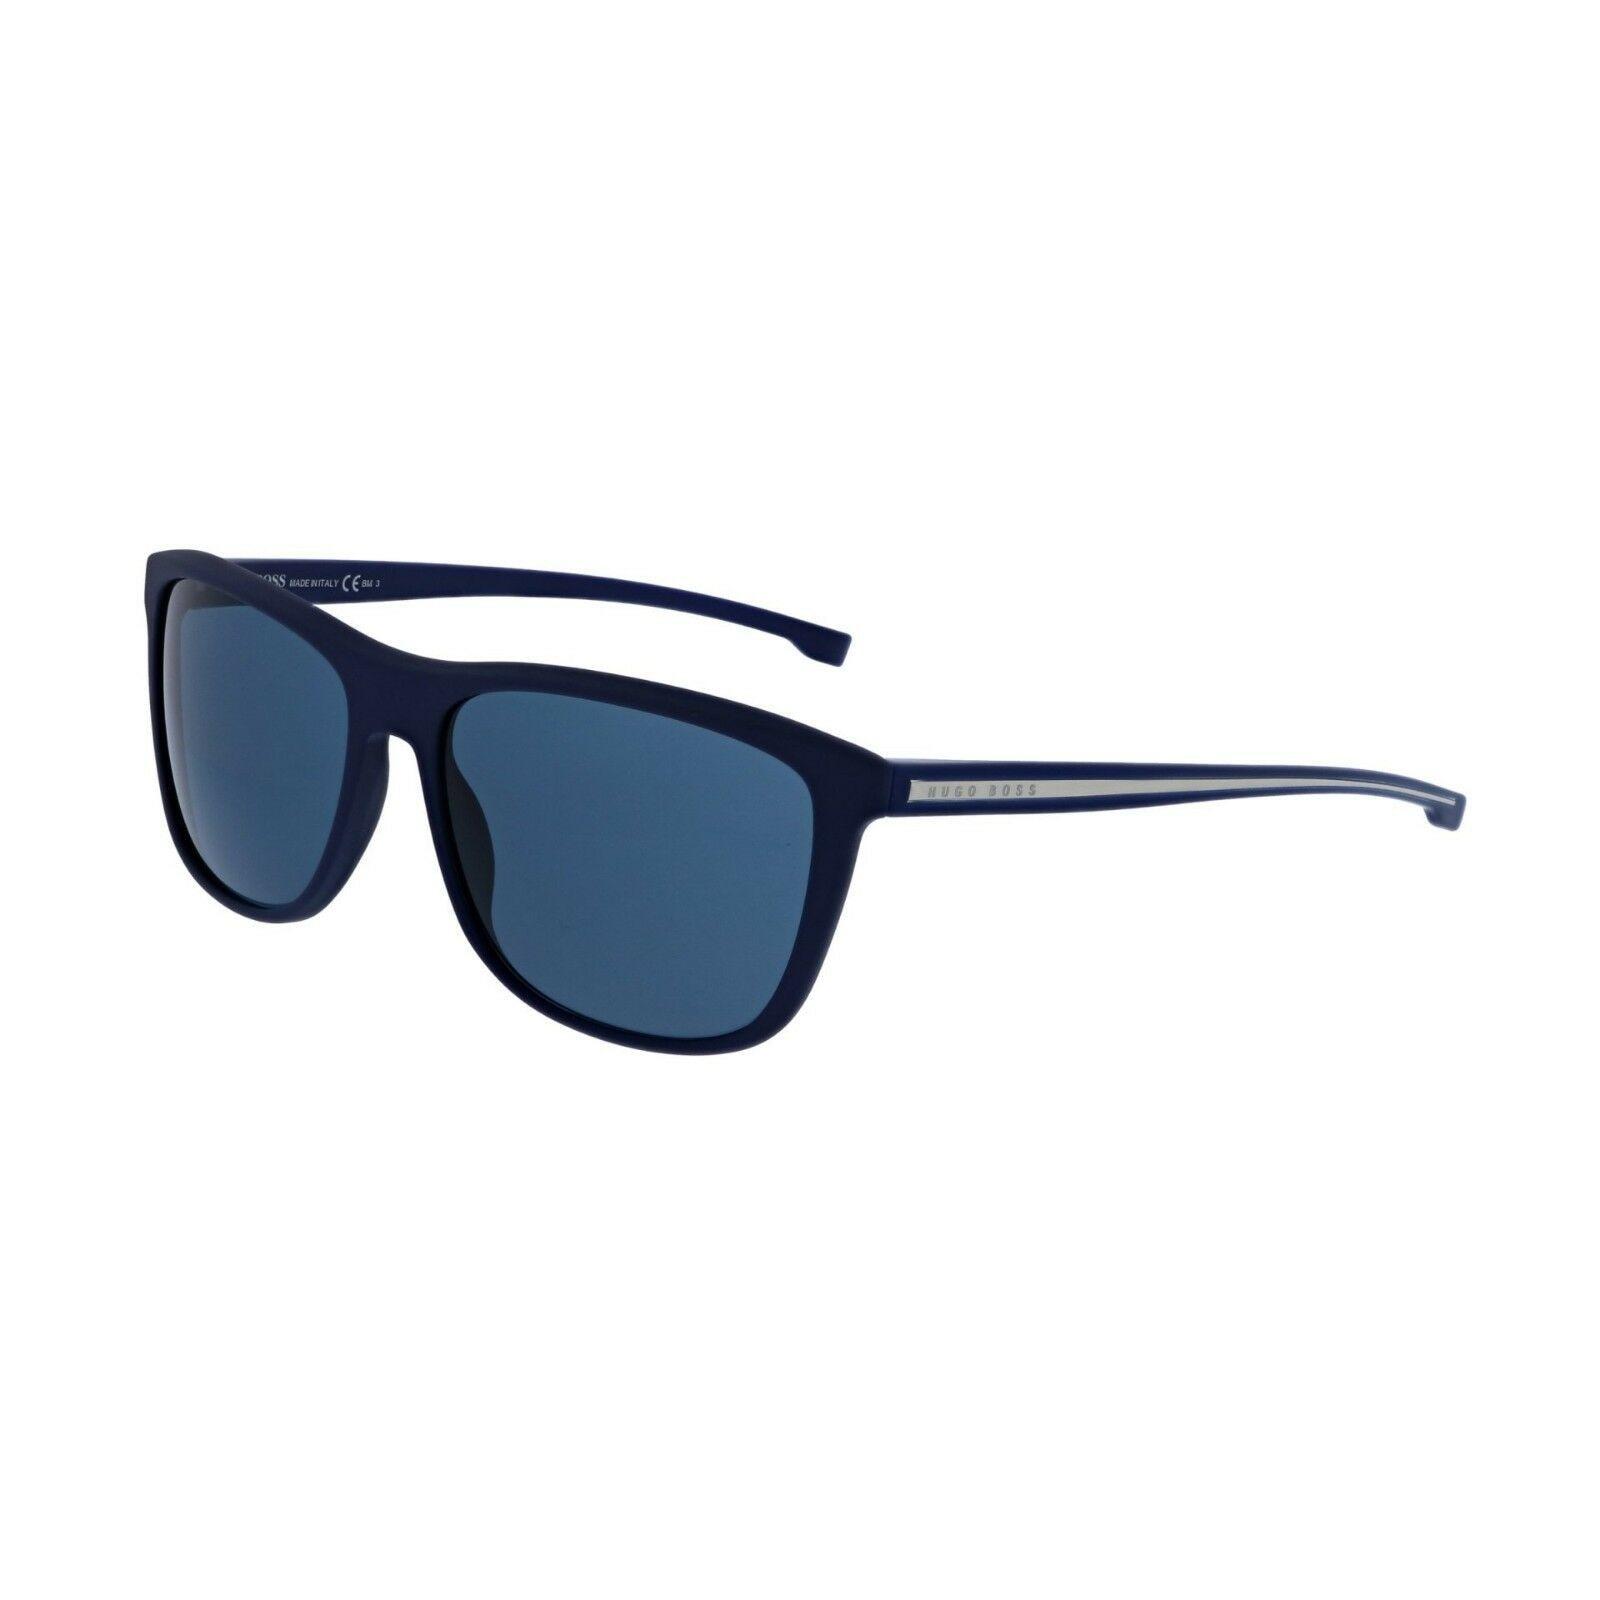 Gafa de sol hugo boss 0874/s 05x (9a) azul mate